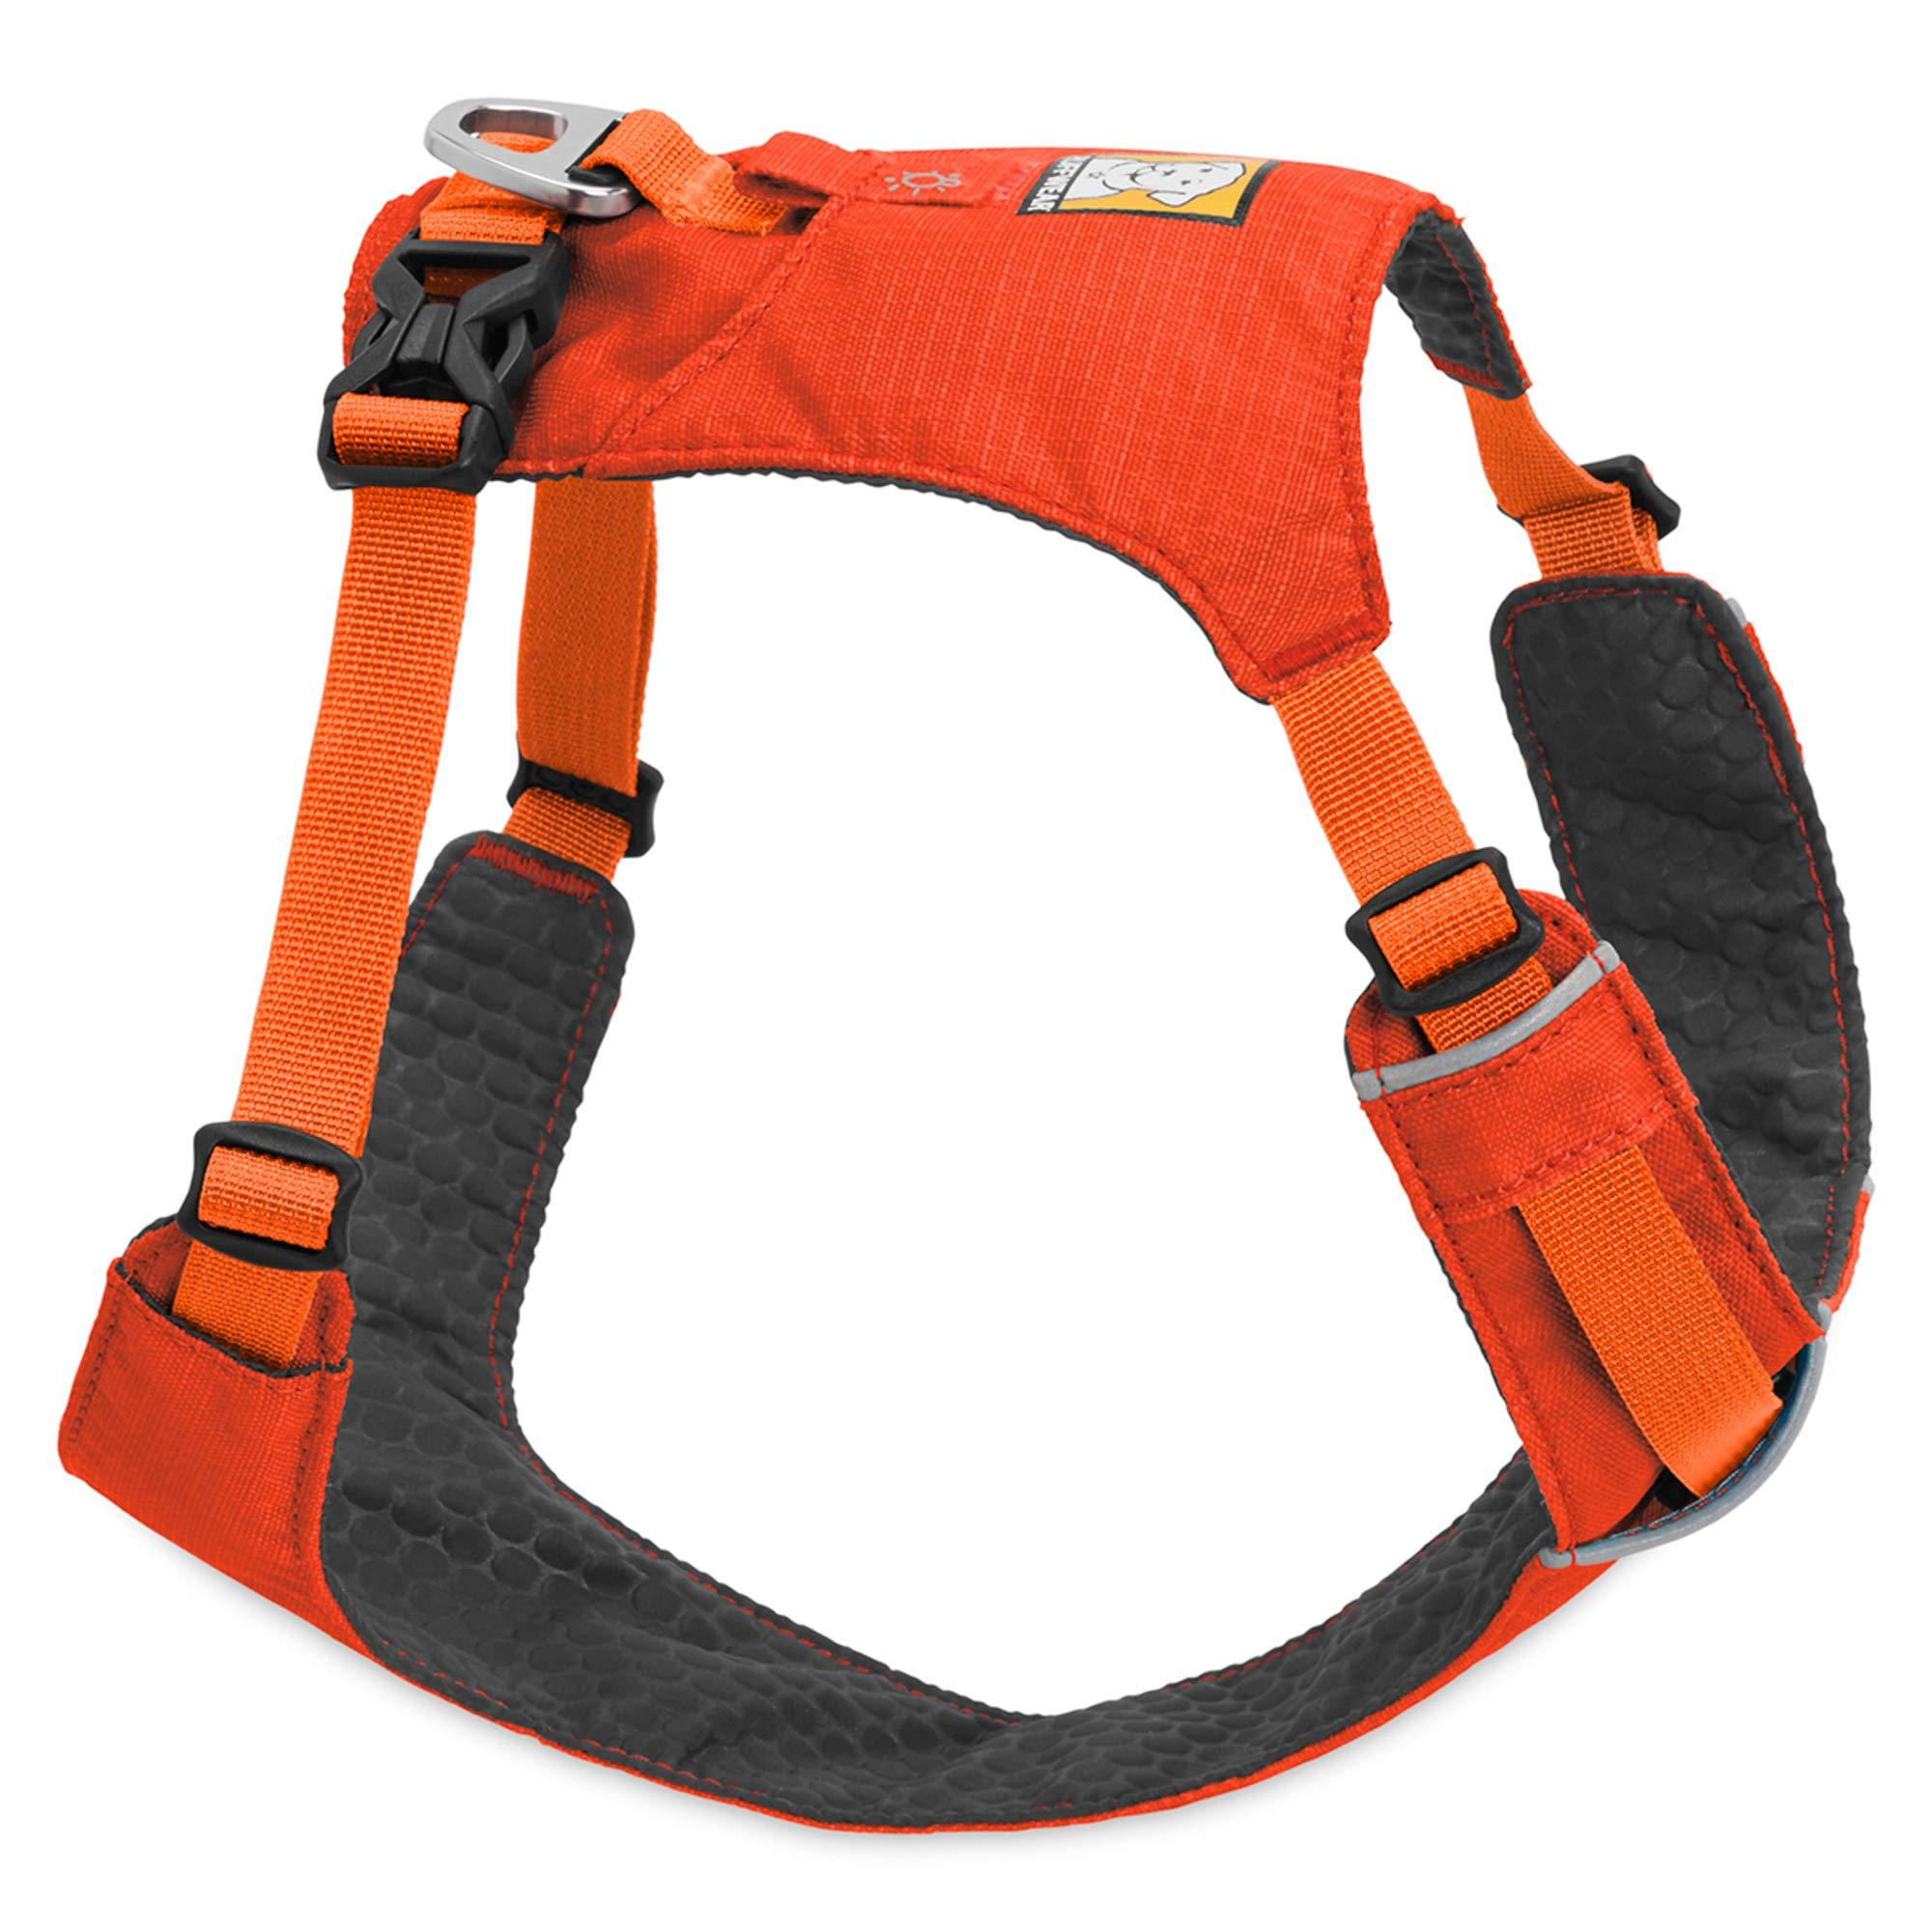 RUFFWEAR Lightweight Dog Harness, Medium Breeds, Adjustable Fit, Size: Medium, Sockeye Red, Hi & Light Harness, 3082-601M